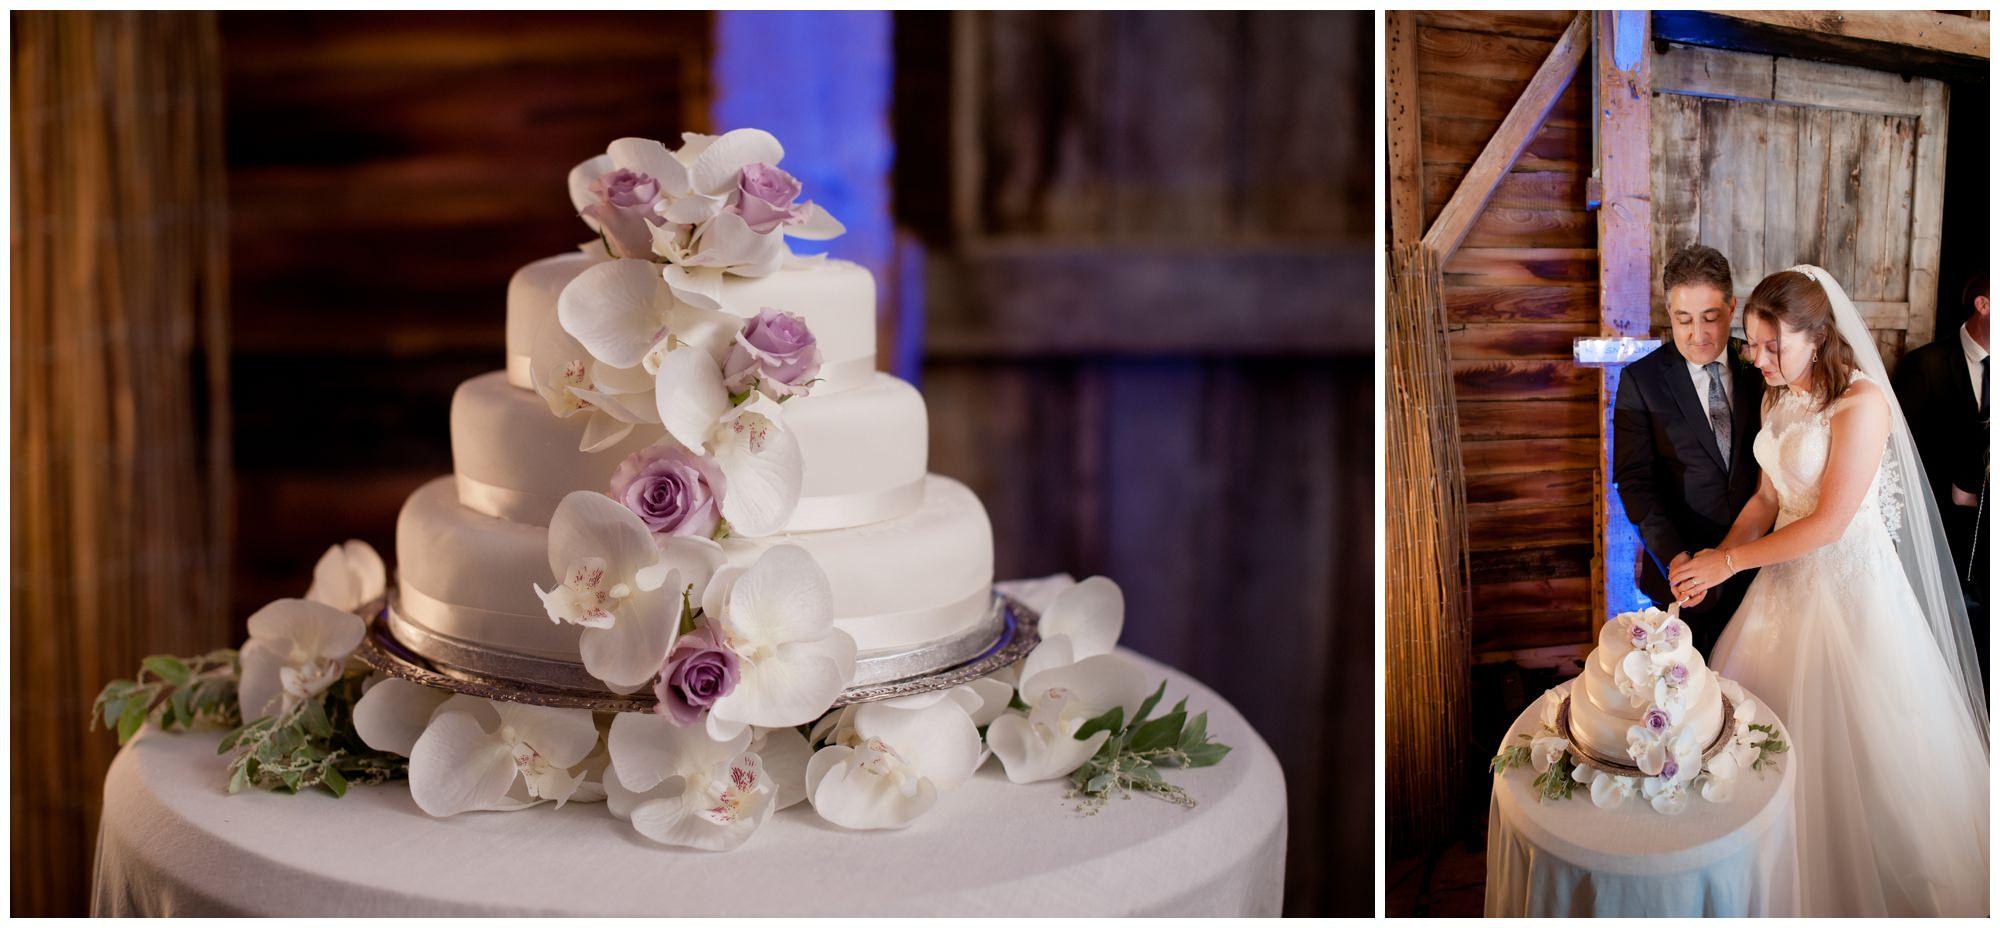 Cake Cutting at Hampshire Wedding